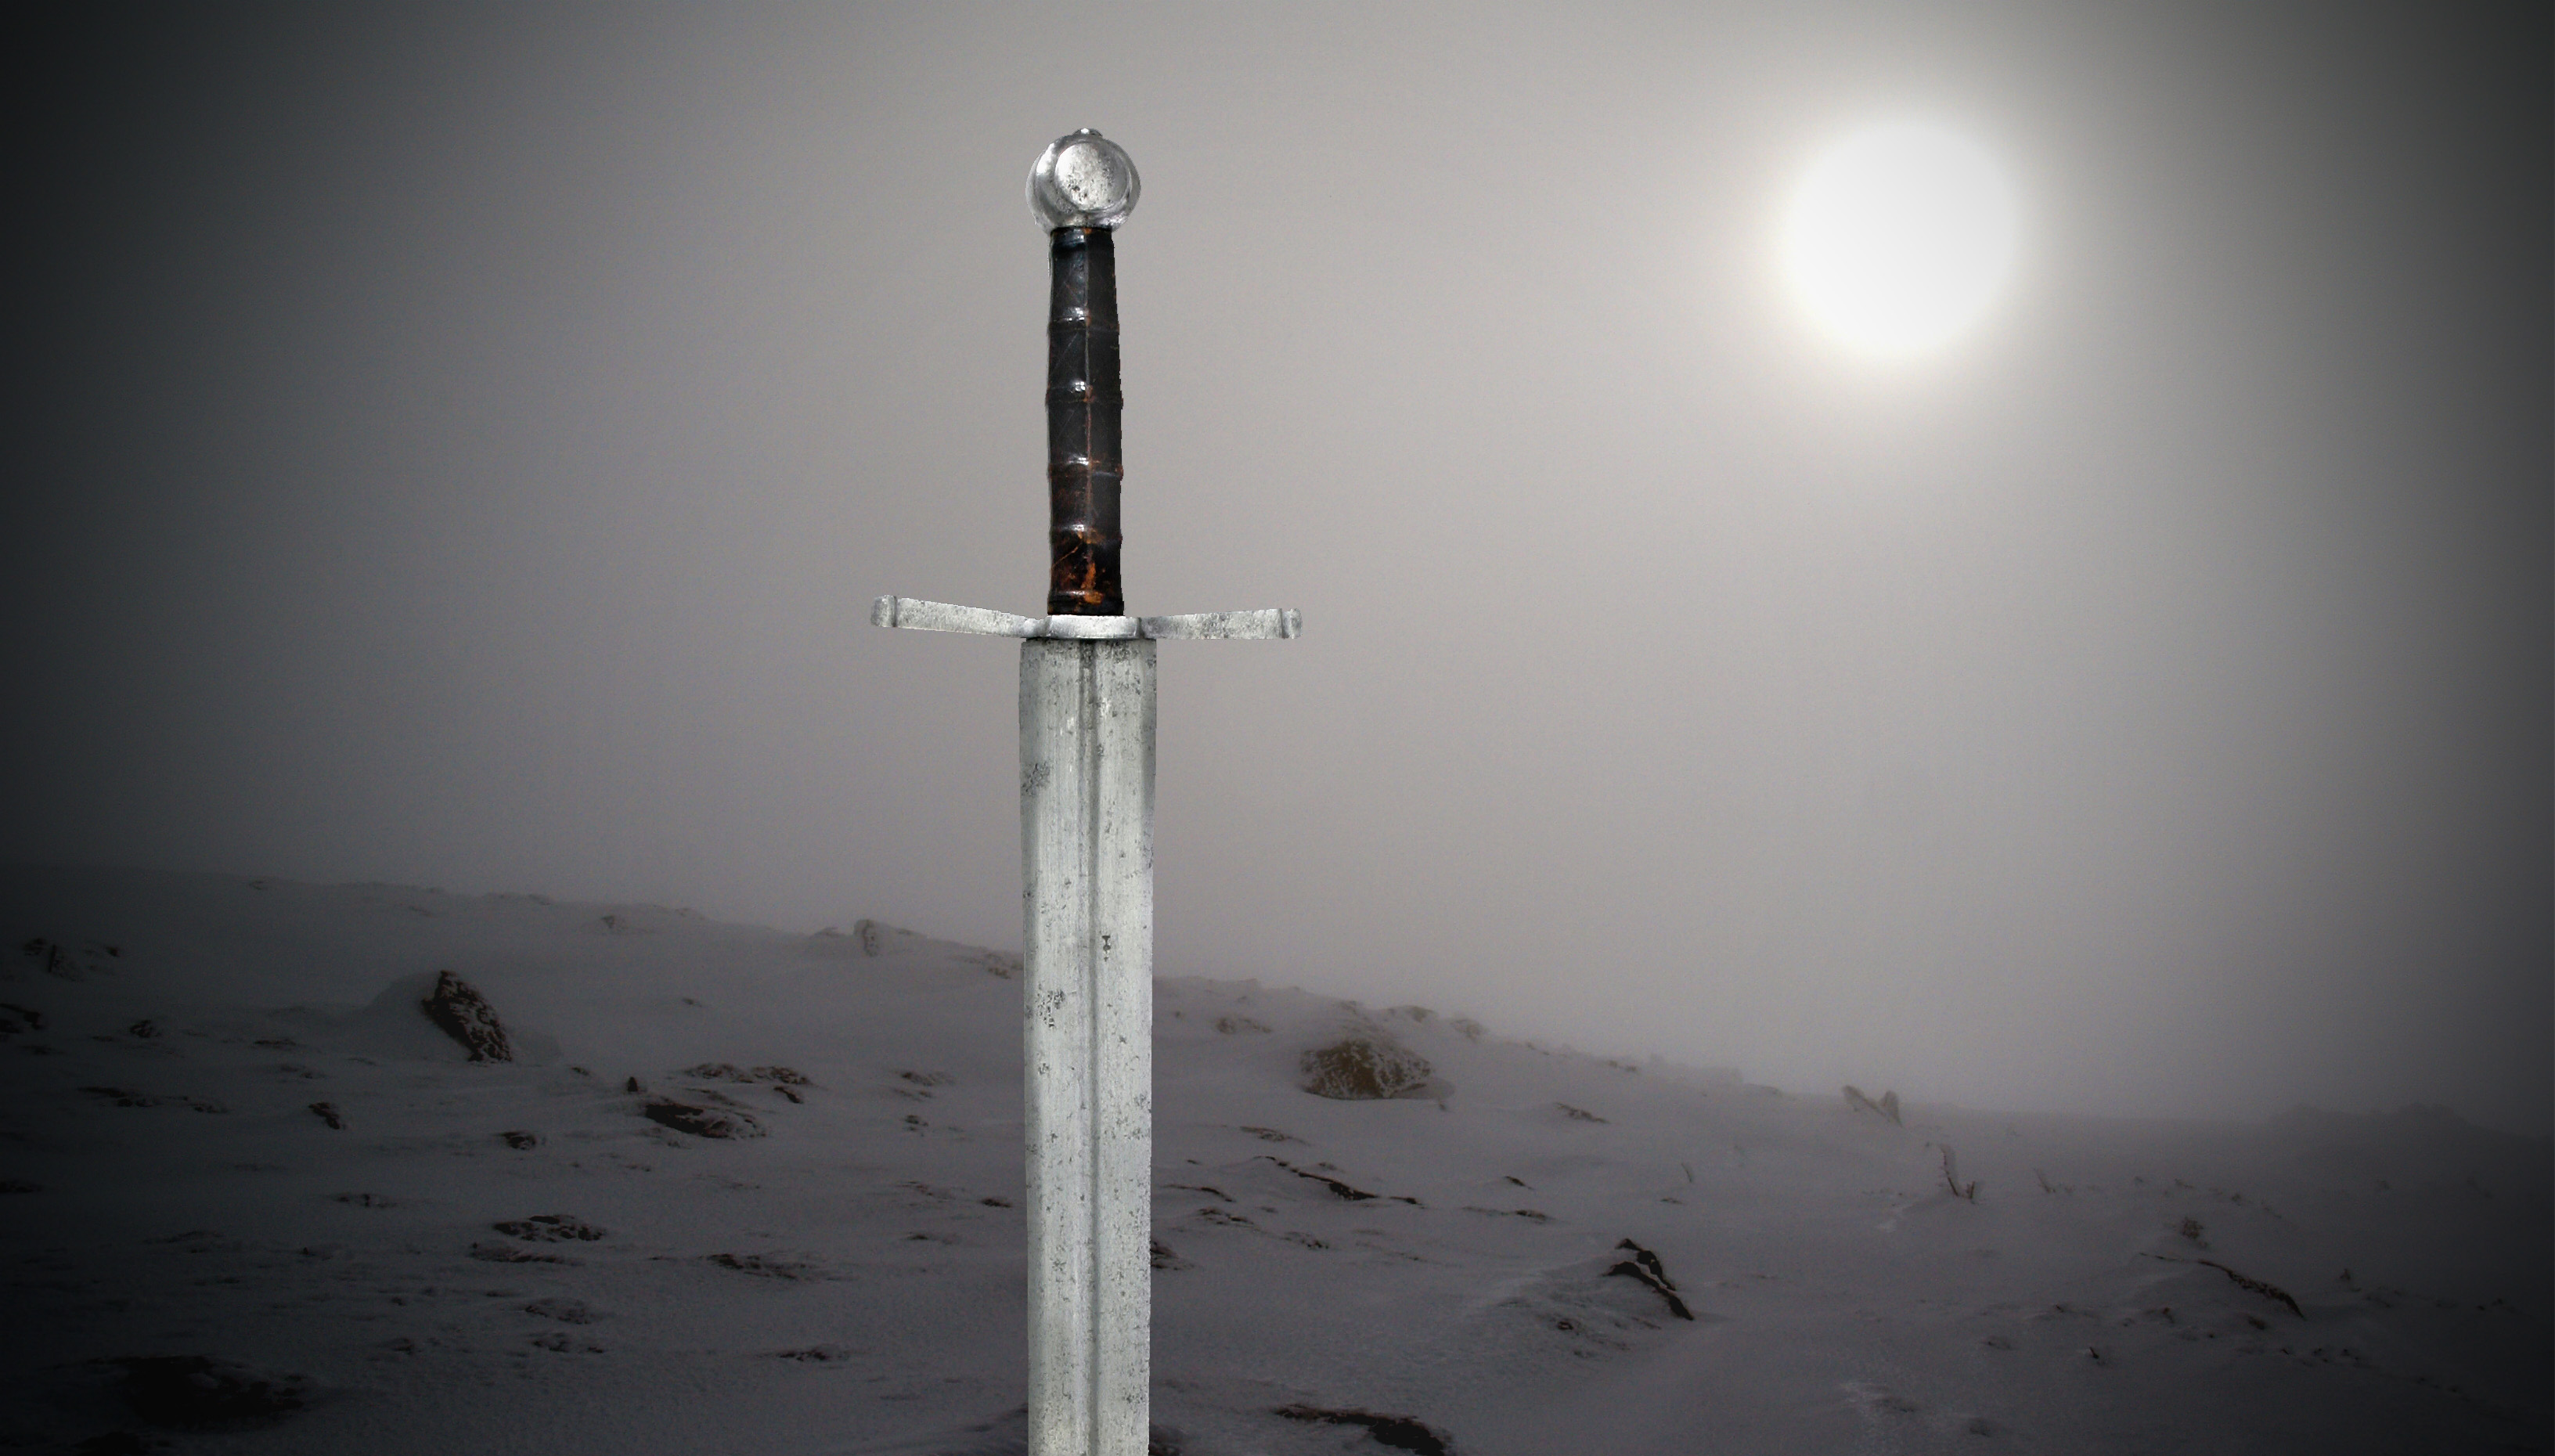 Svärd i dimman, Olustra. Montage: Johan Eriksson